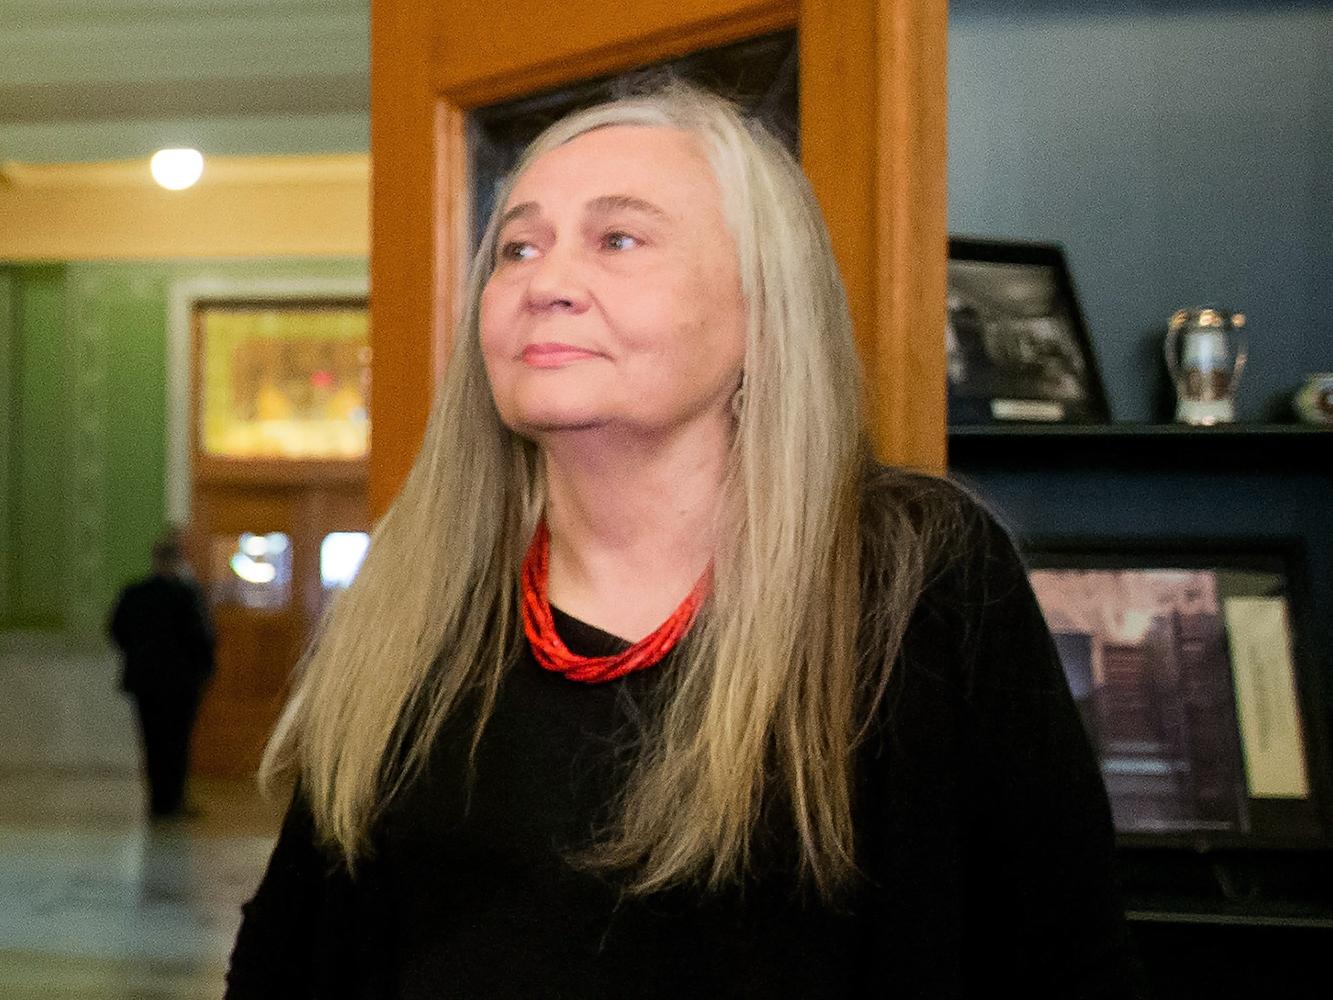 APNewsBreak: Ohio literary peace award to Marilynne Robinson